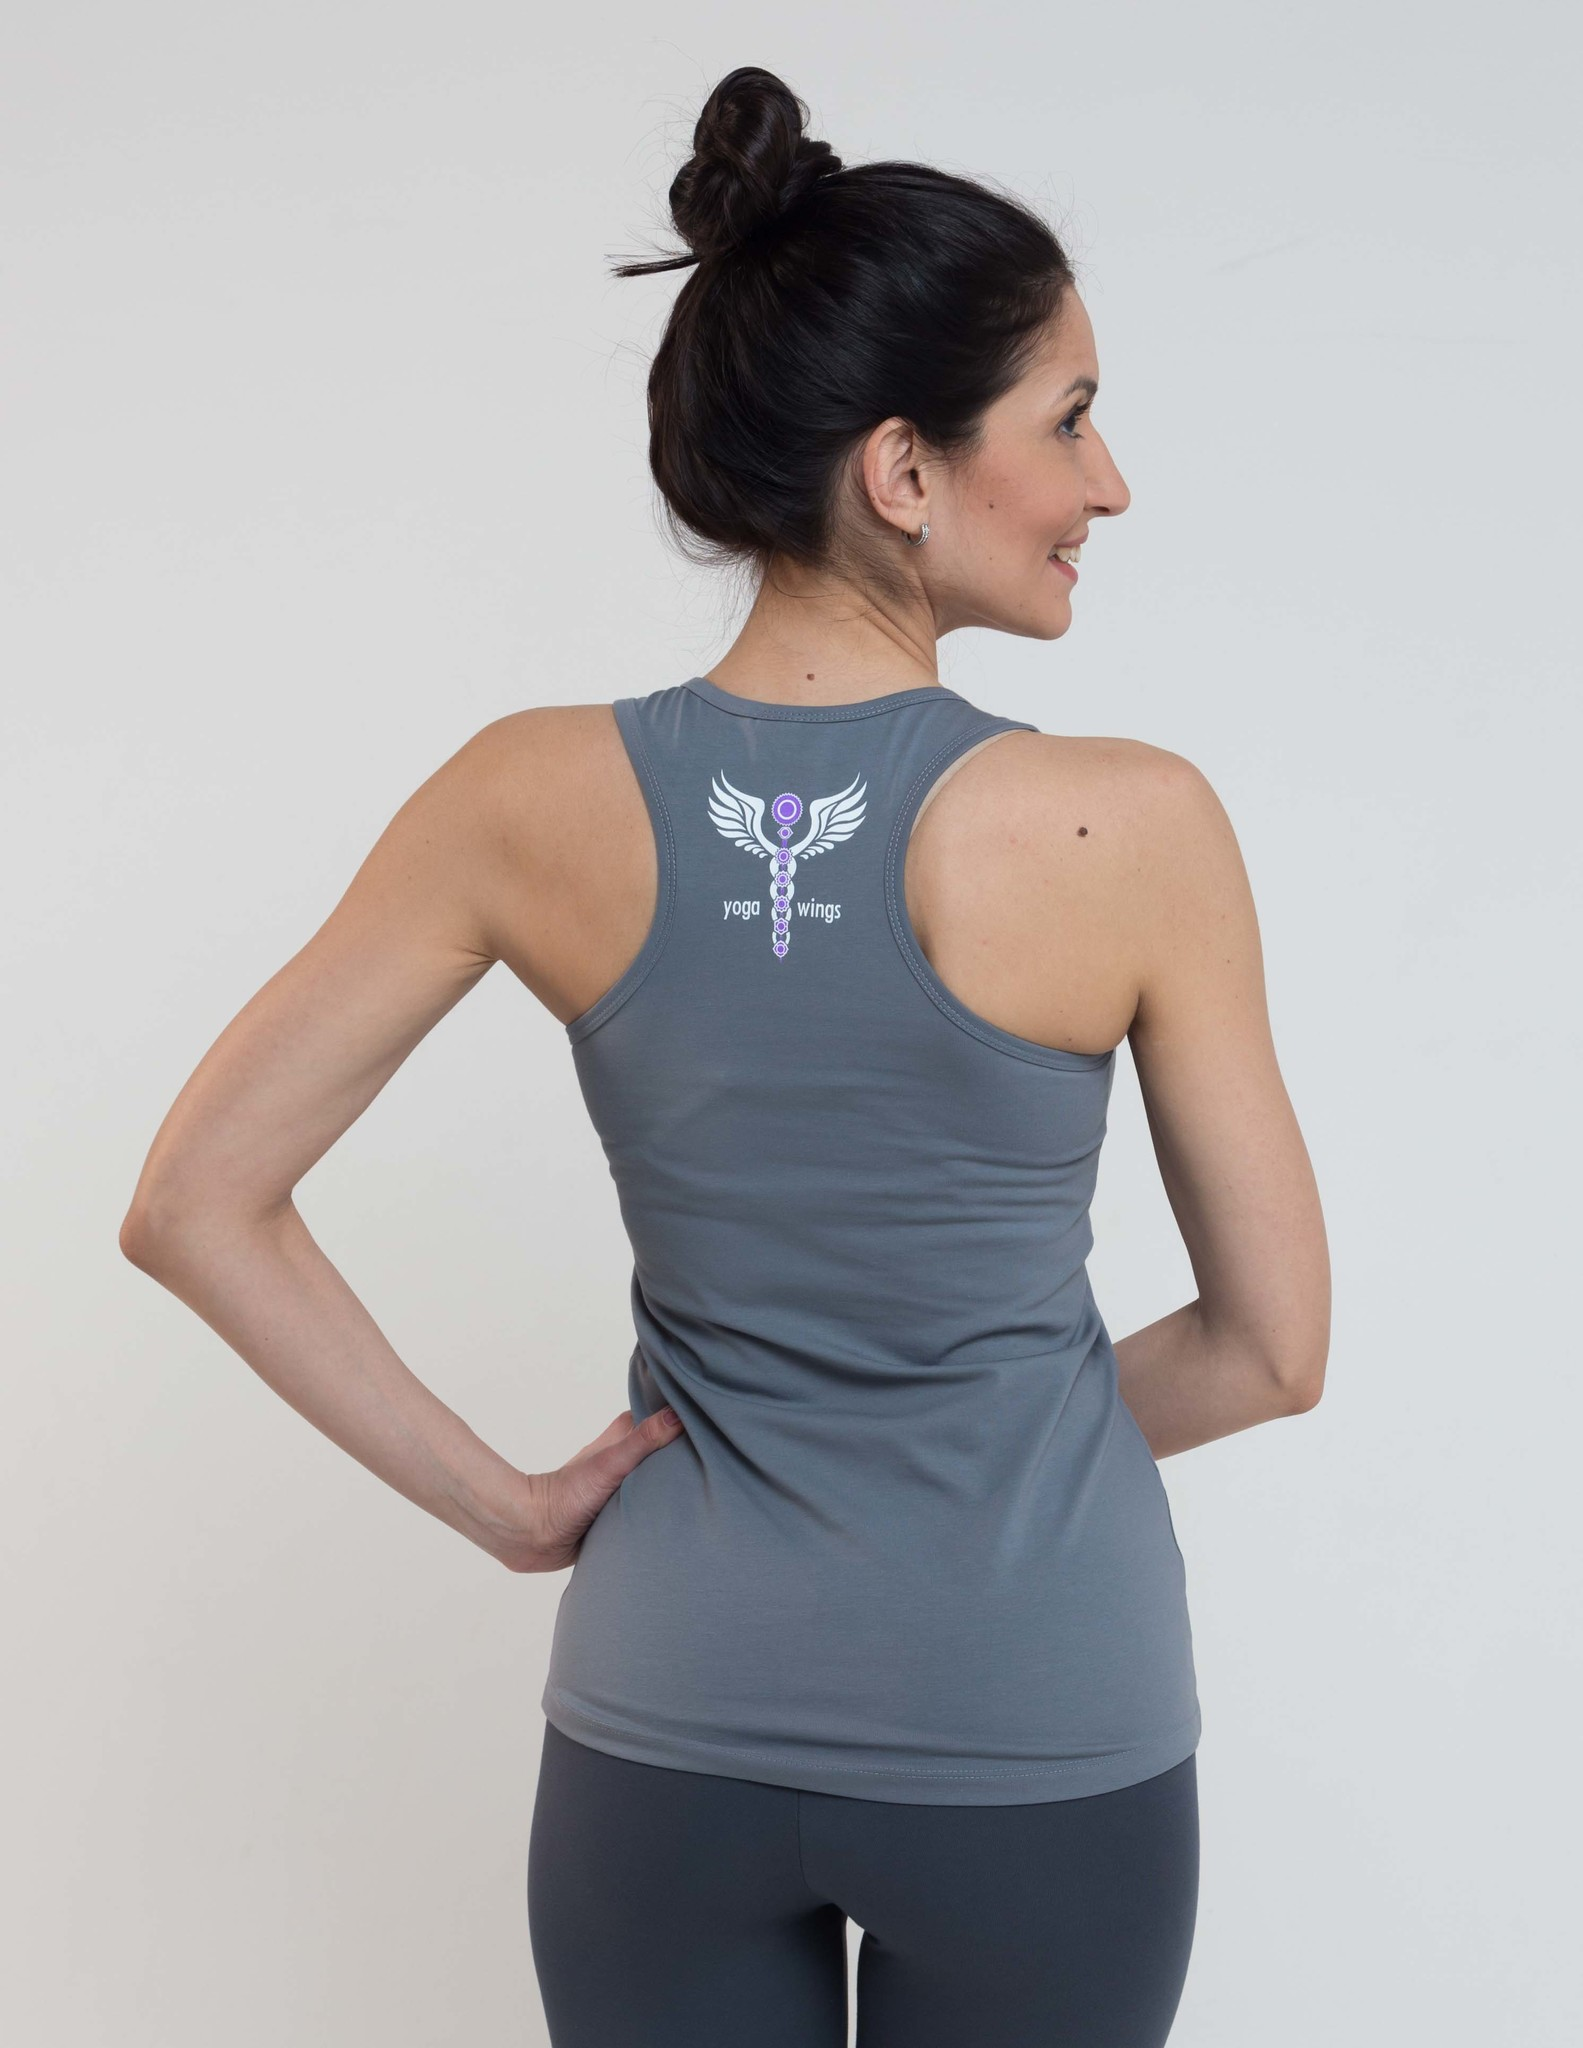 Топ женский Yoga Wings YogaDress ( бордо 0.2 кг 42 ) 1000pcs transistor mpsa 42 mpsa42 a42 mps a42 to 92